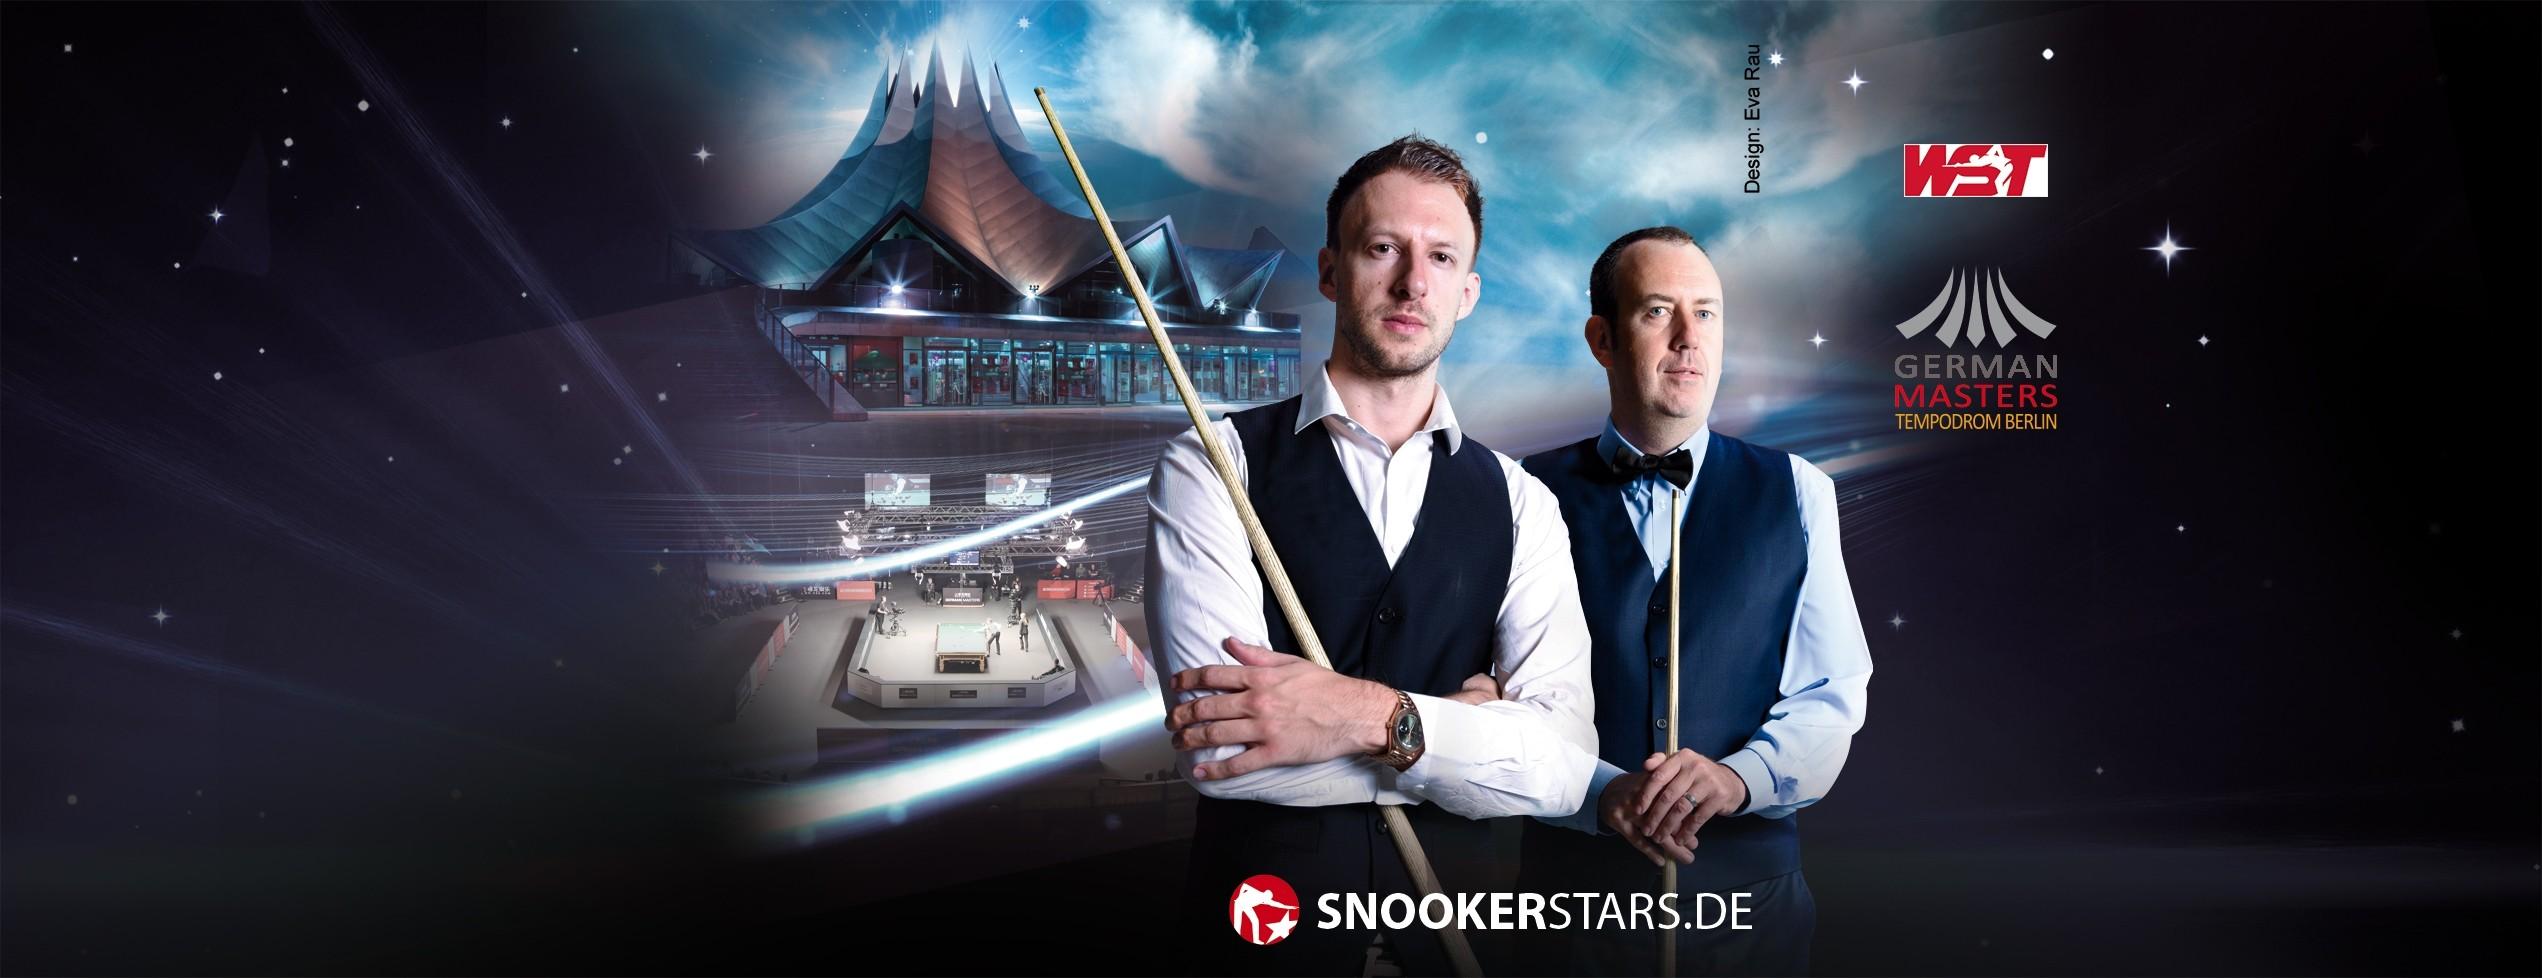 German Masters 28.01.2022 KAT 1 Abend-Session